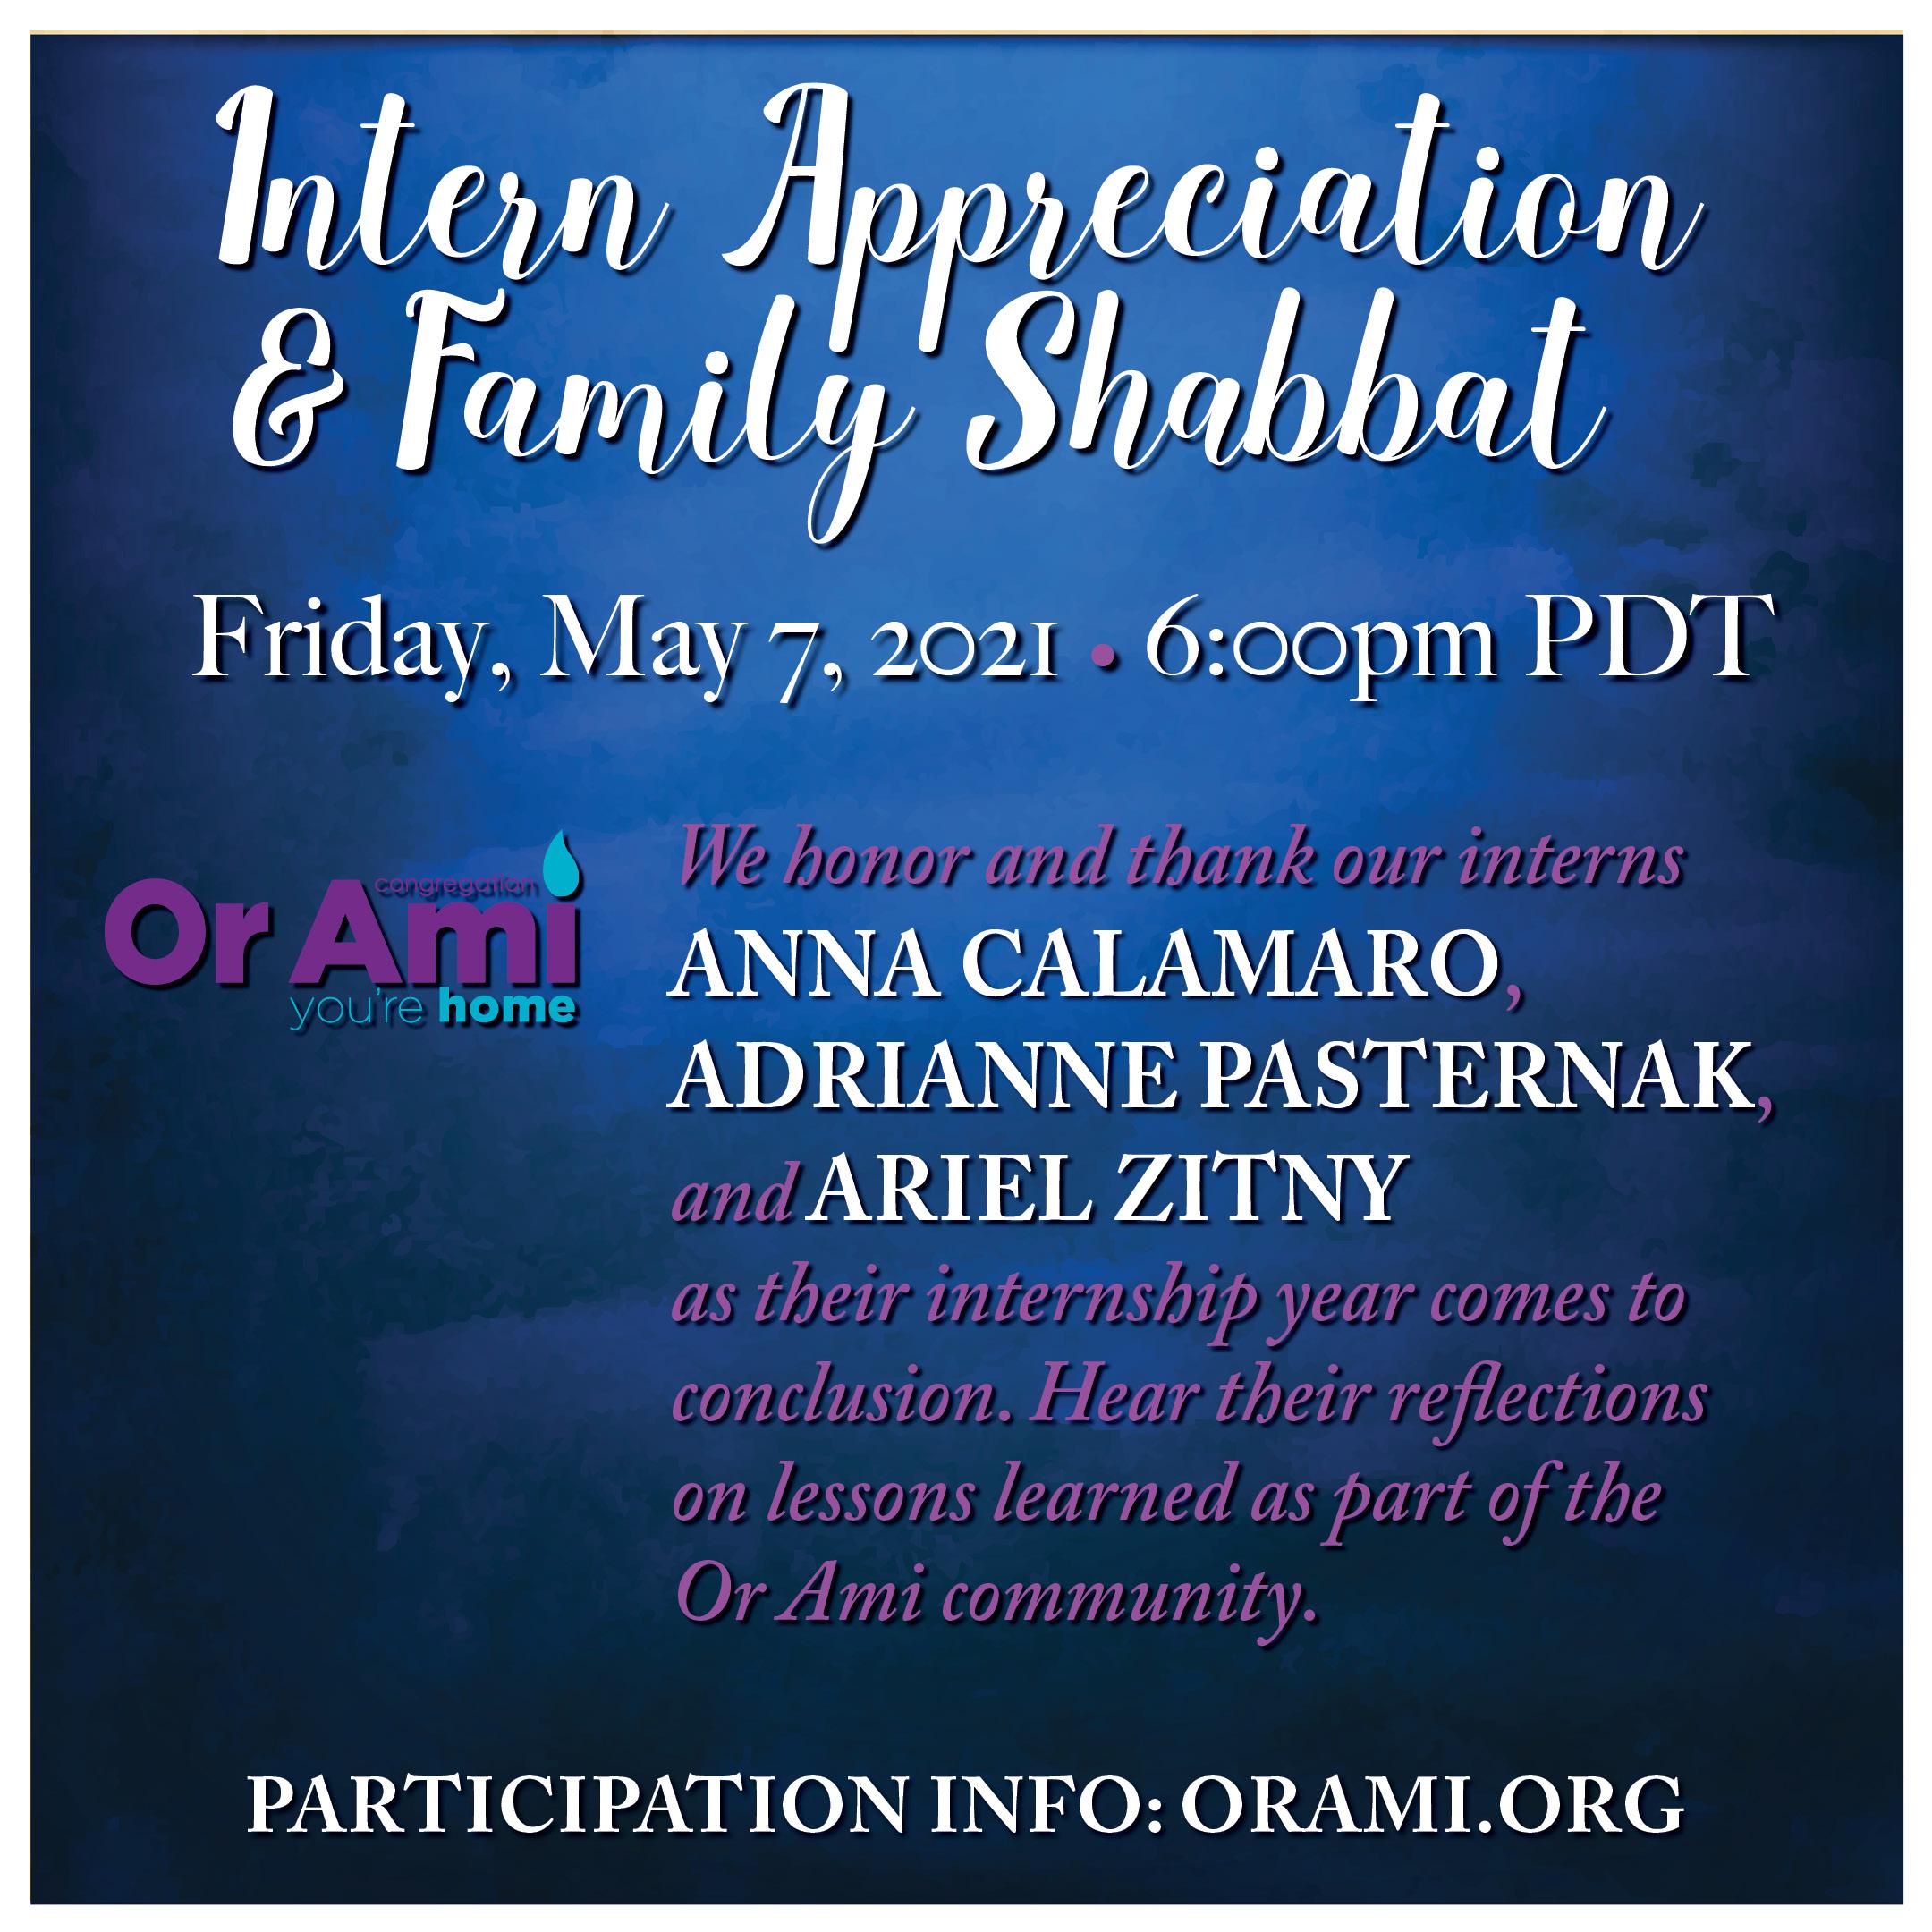 Or Ami Intern Appreciation and Family Shabbat 21 (2)